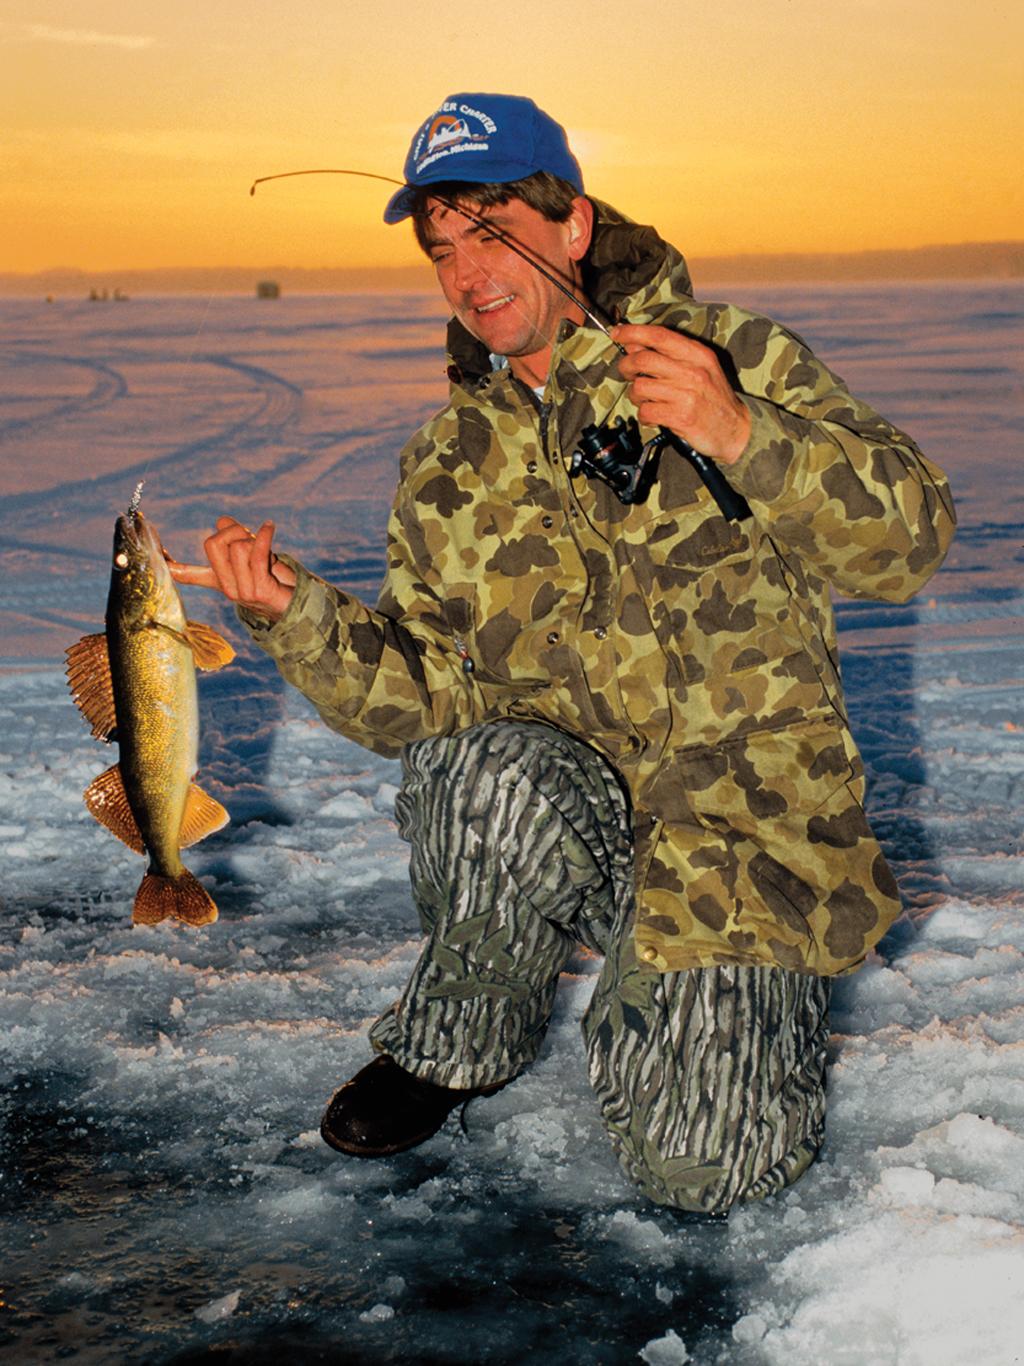 Hot Michigan Ice-Fishing Options